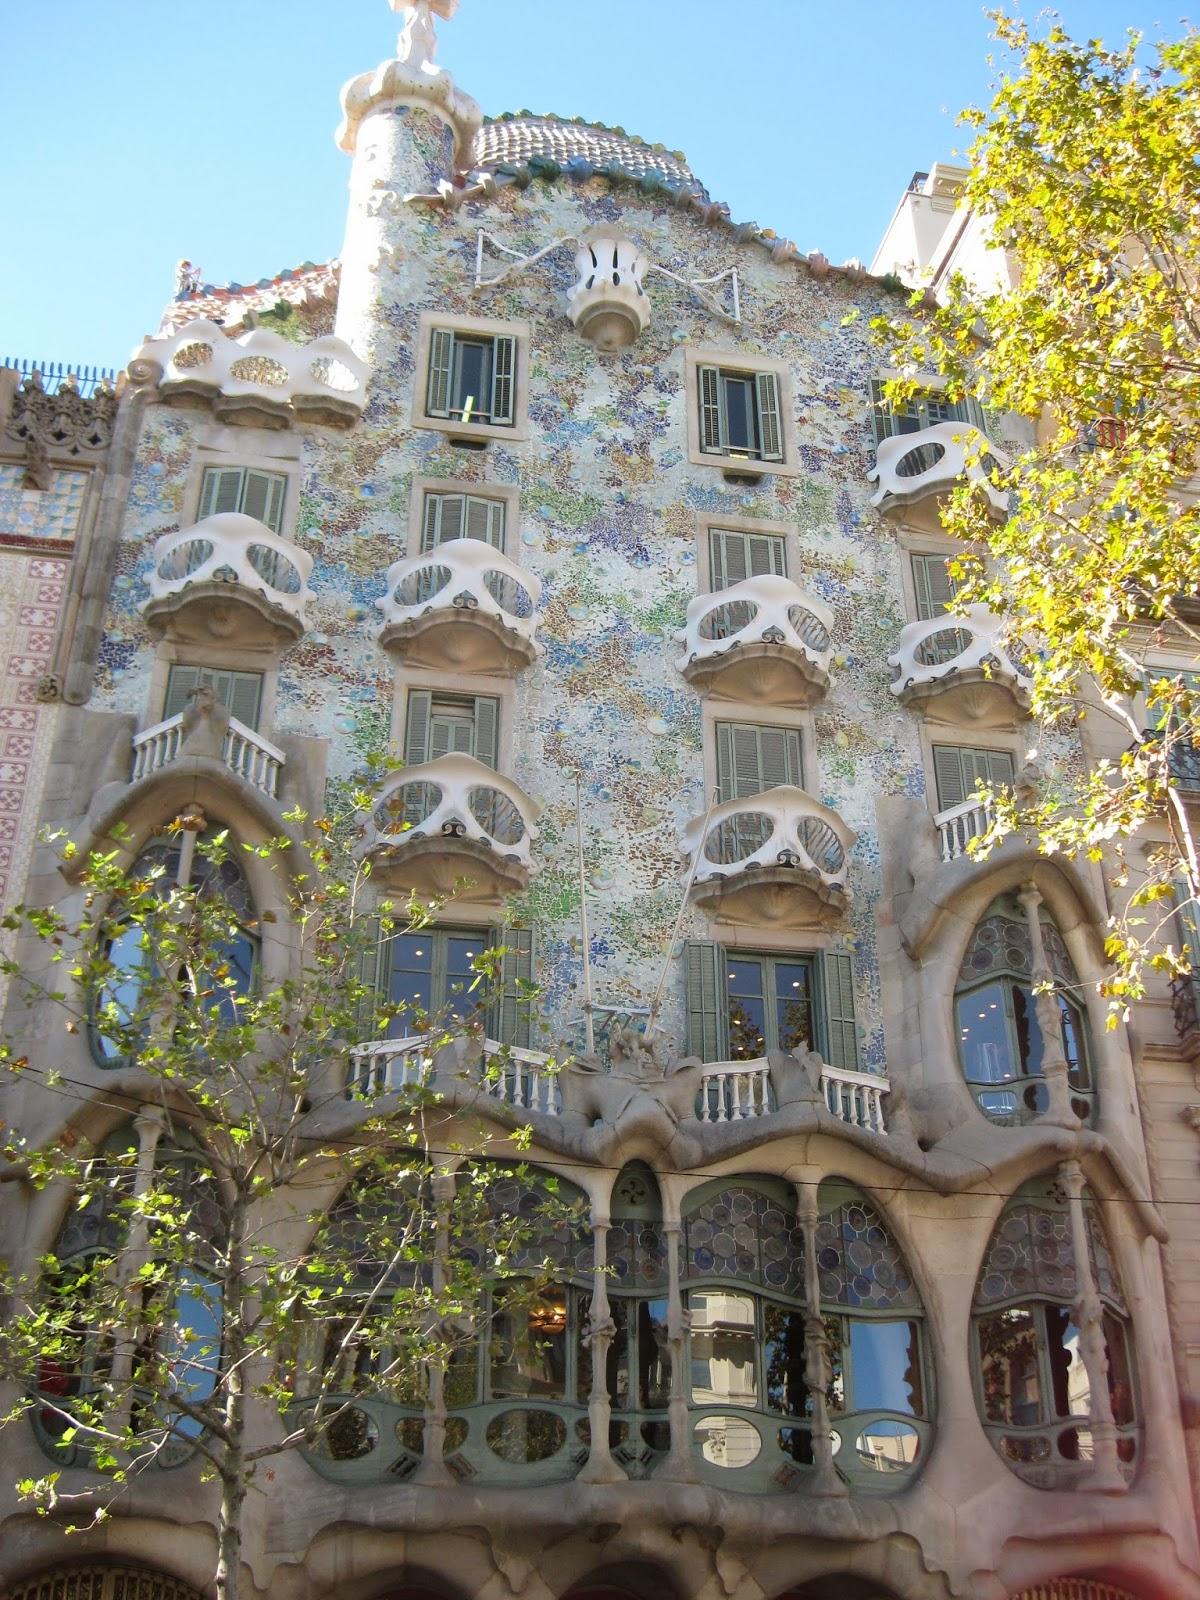 Barcelona - Gaudi's Casa Batllo